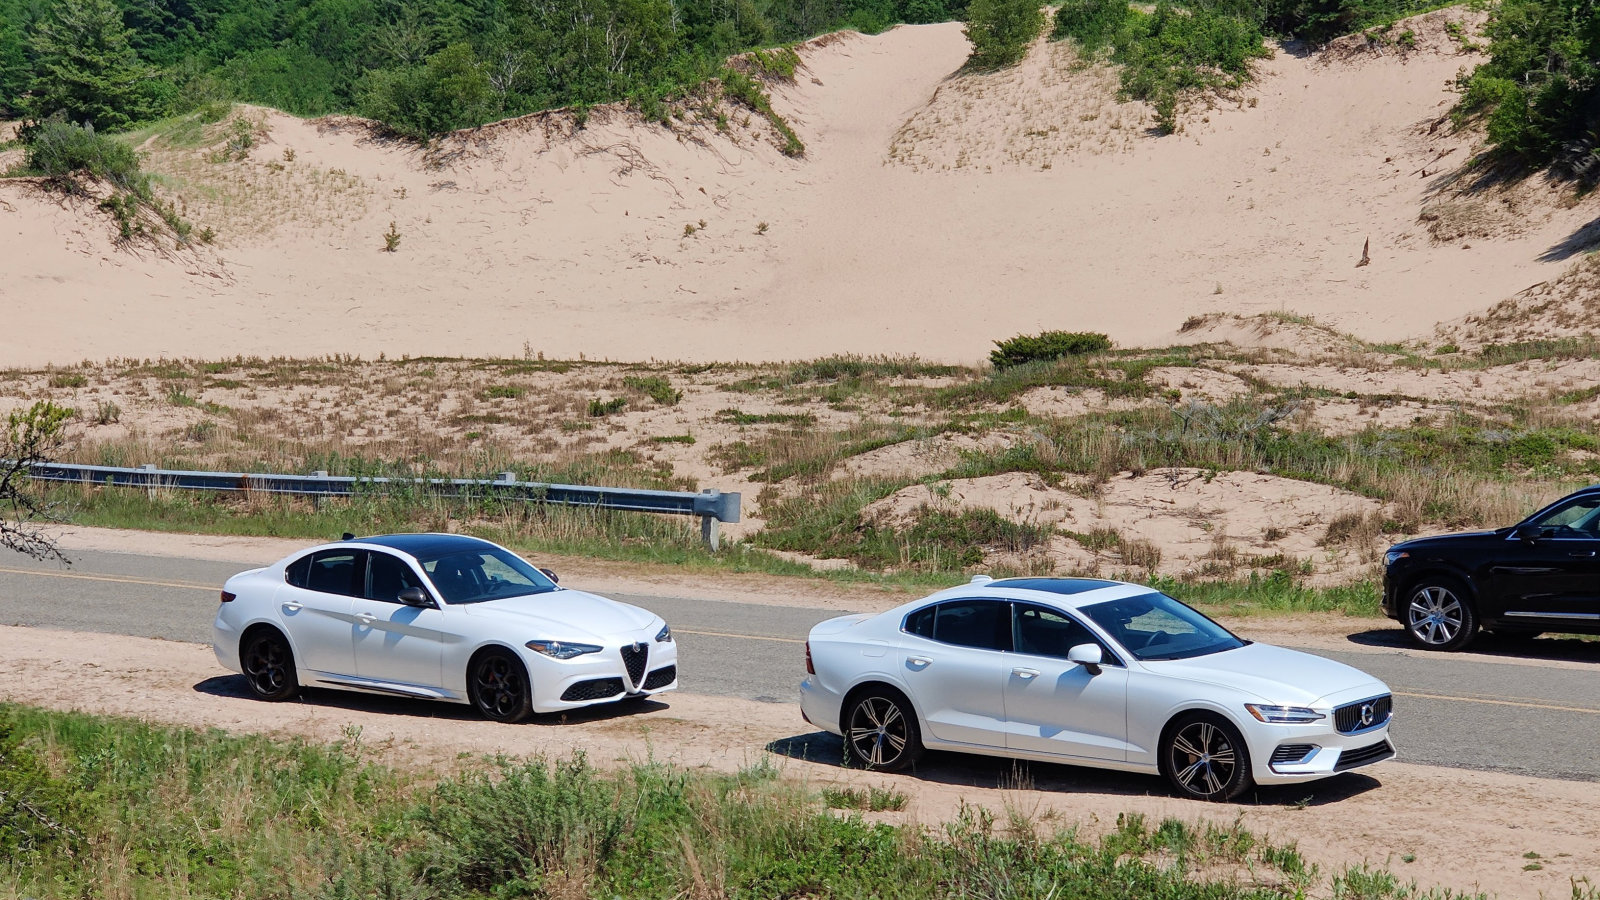 2020 Volvo S60 T8 Long-Term Update We go across the 10,000- mile mark